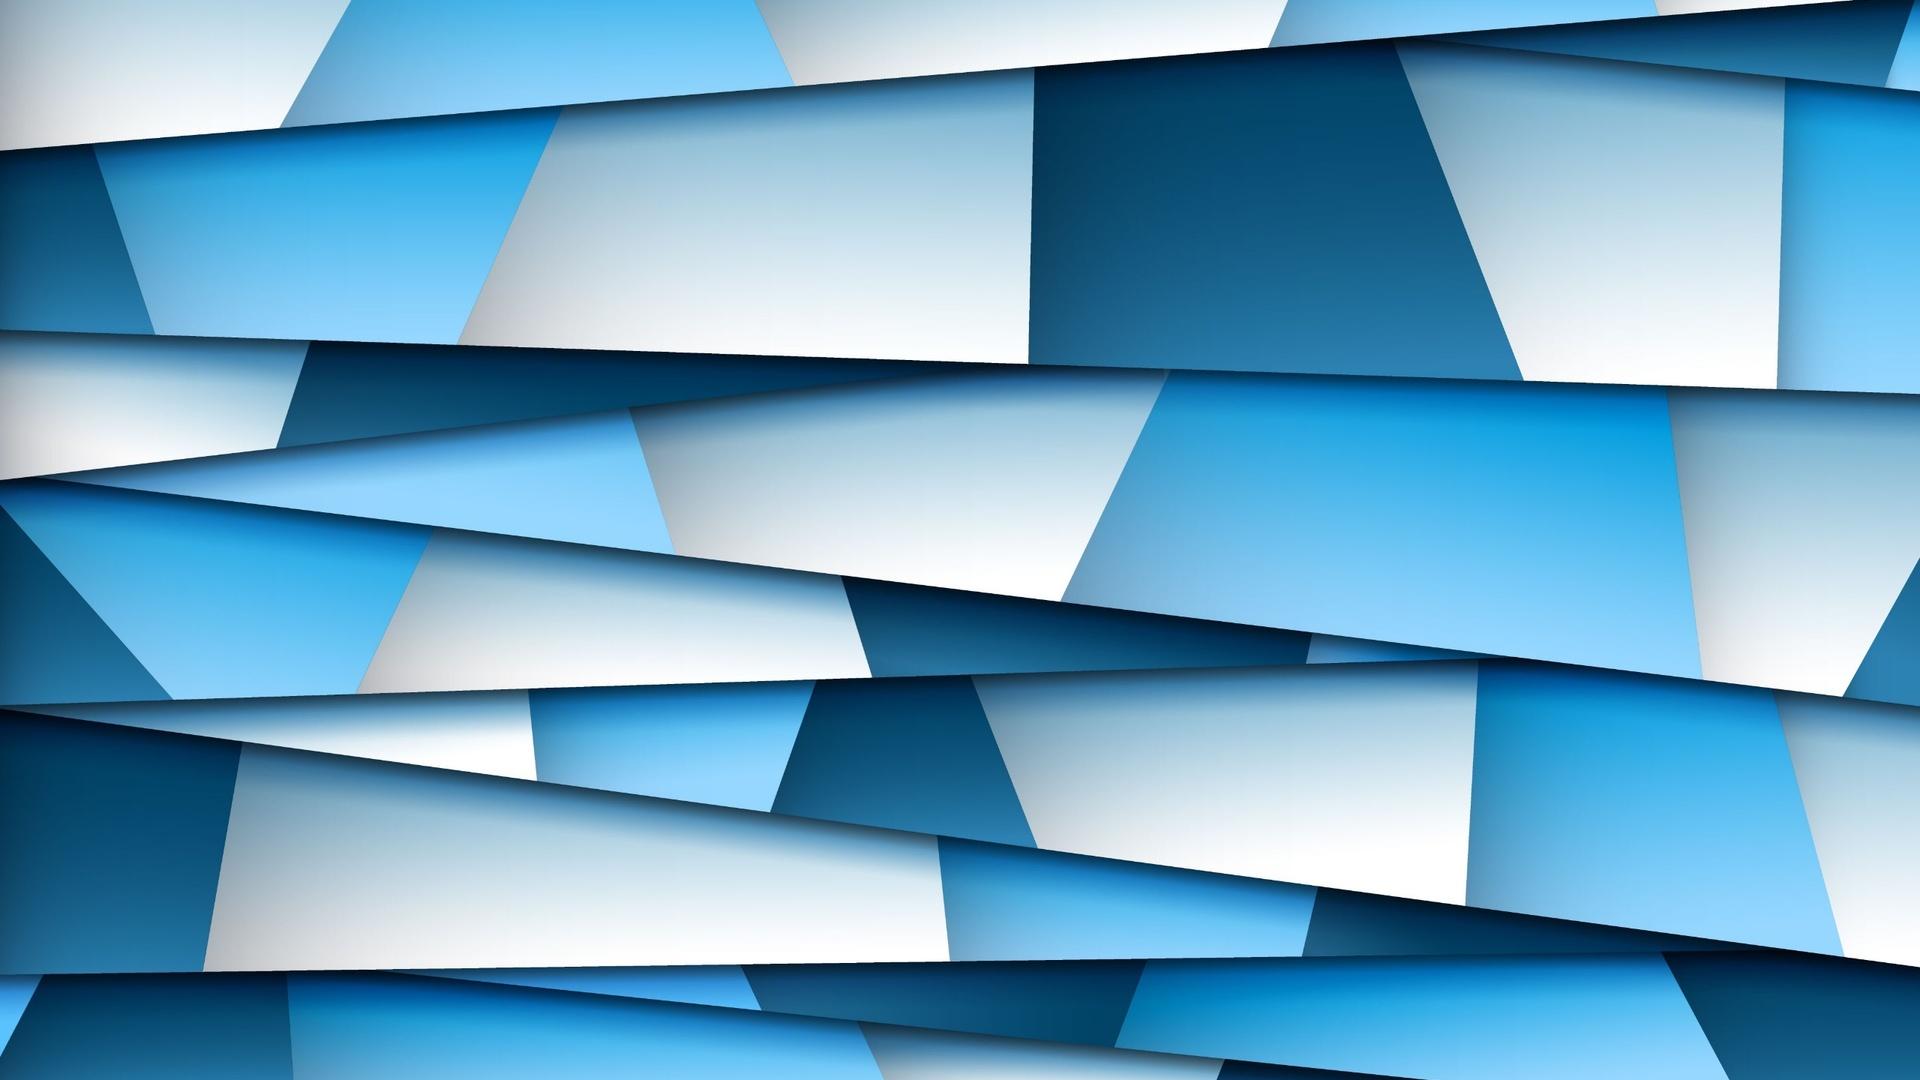 1920x1080 Abstract Blue Texture Laptop Full HD 1080P HD 4k ...